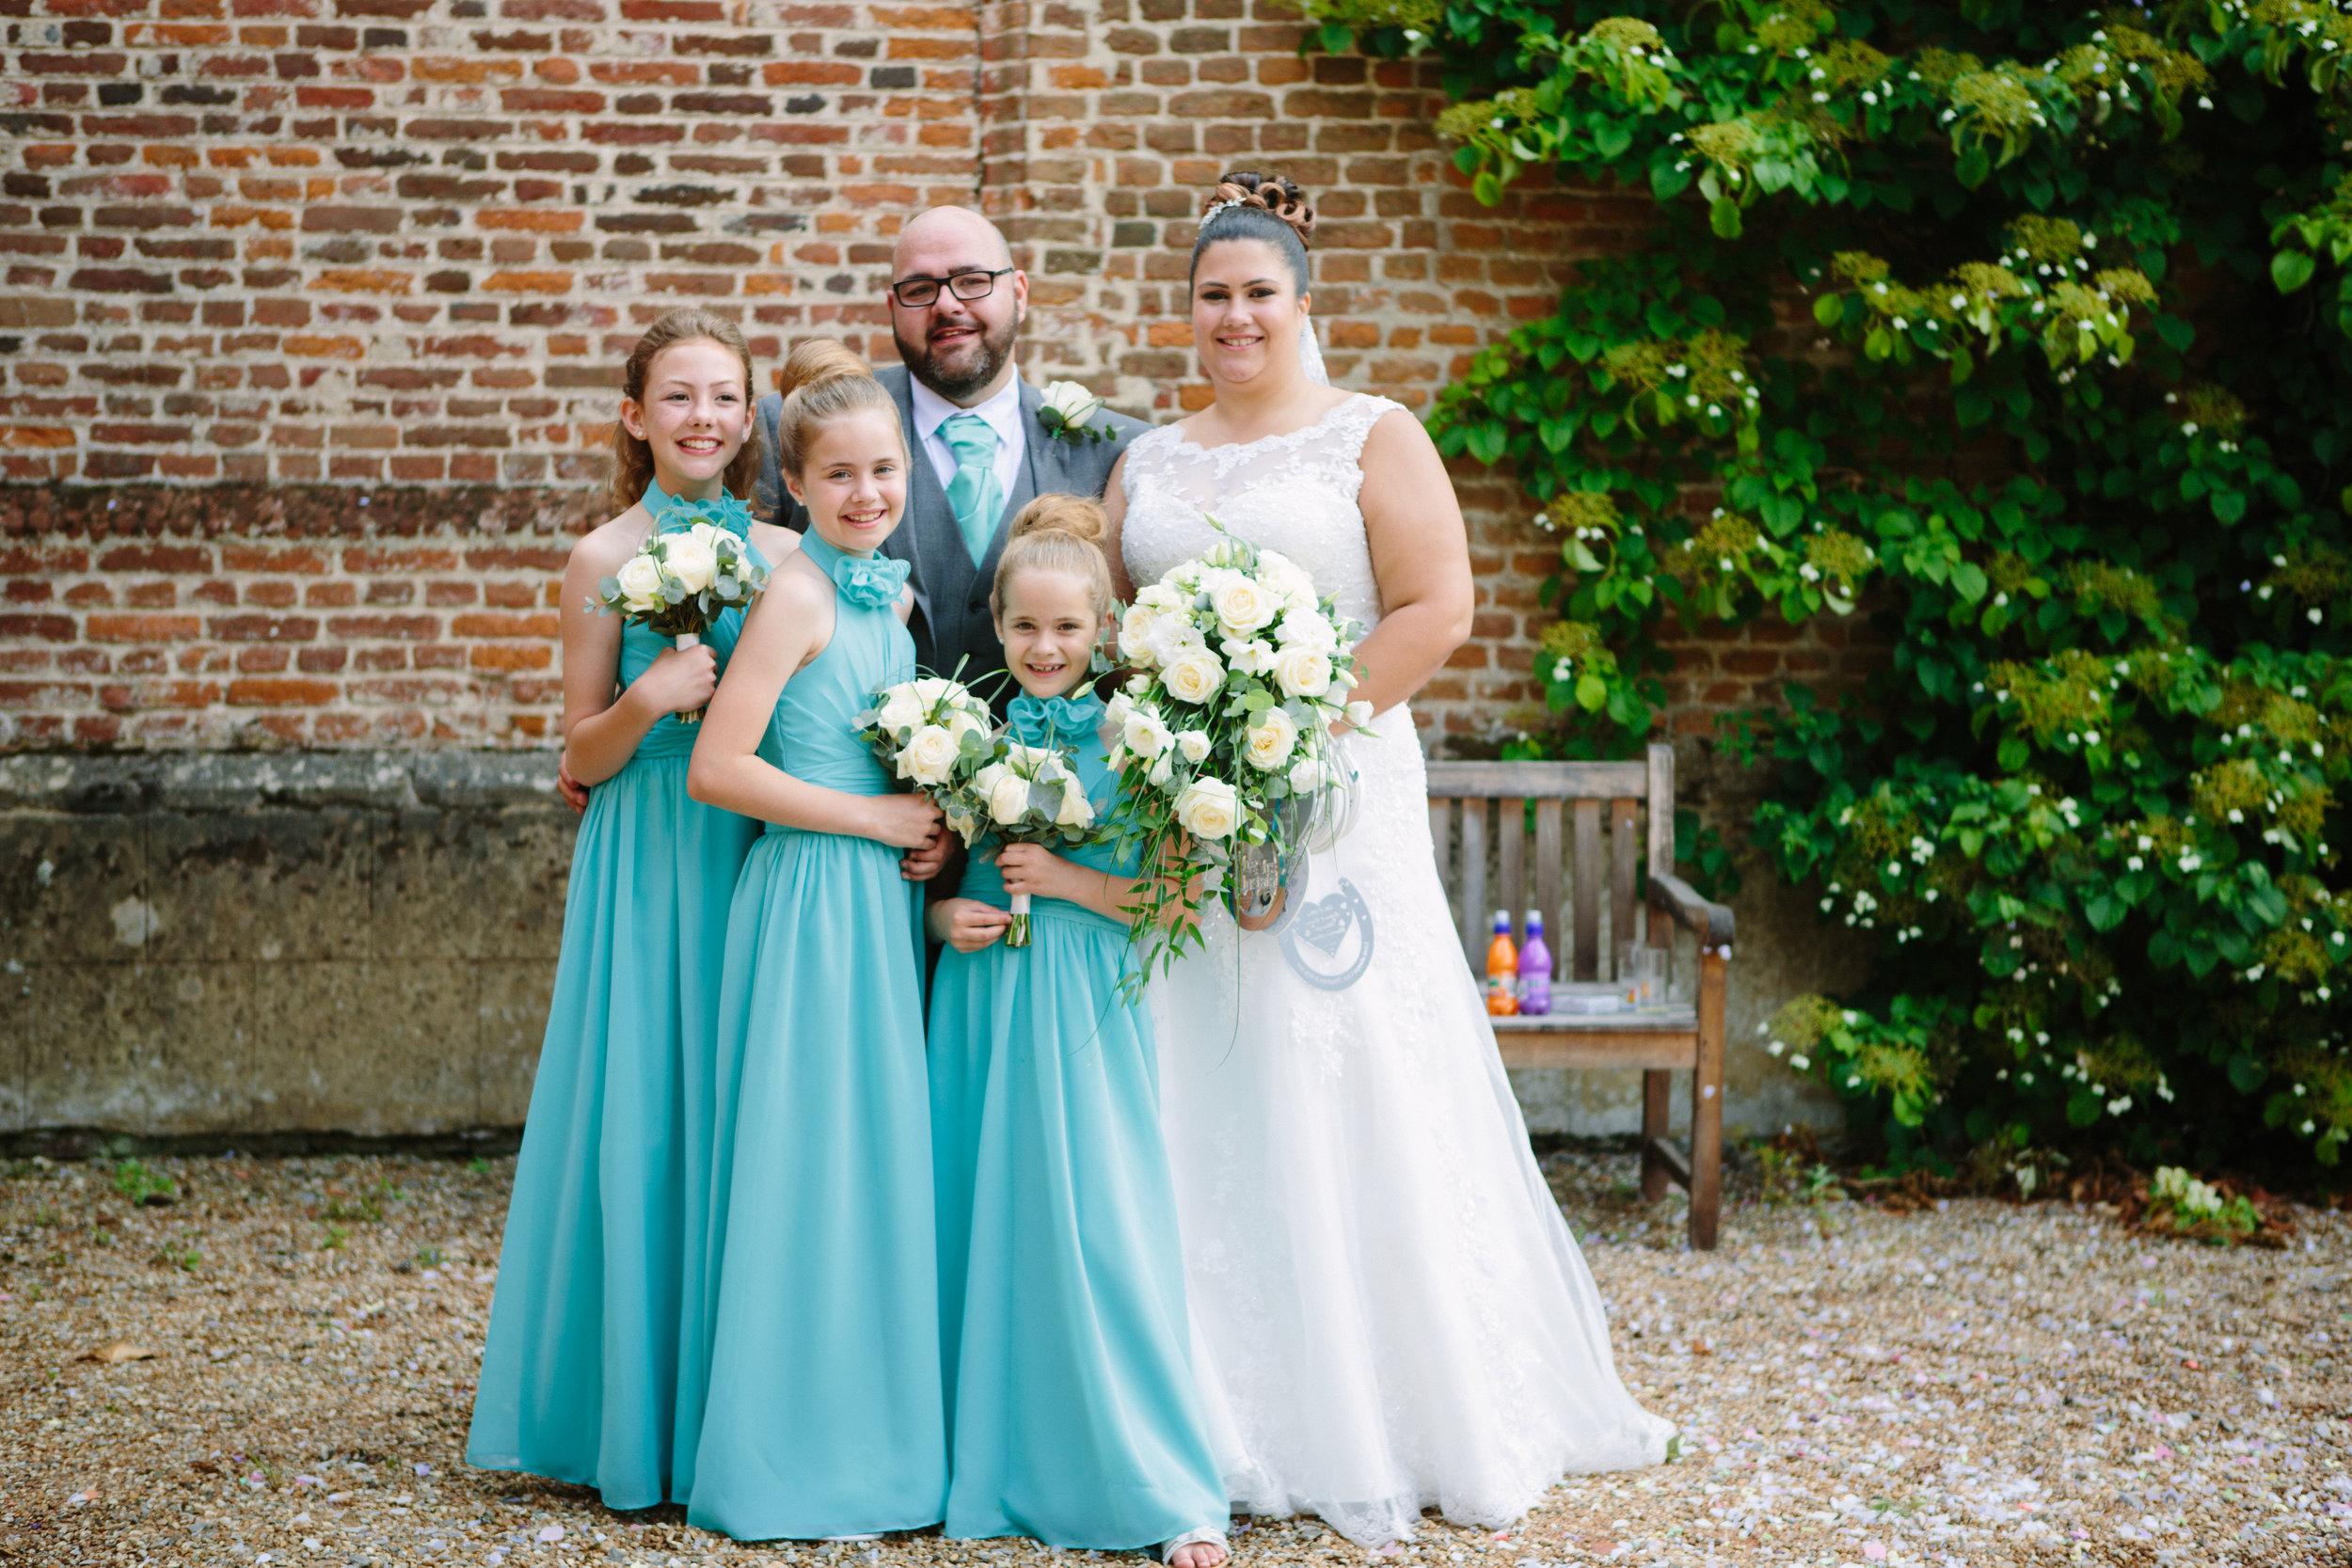 westenhangar-castle-kent-london-wedding-photography-formal-portrait-group-46